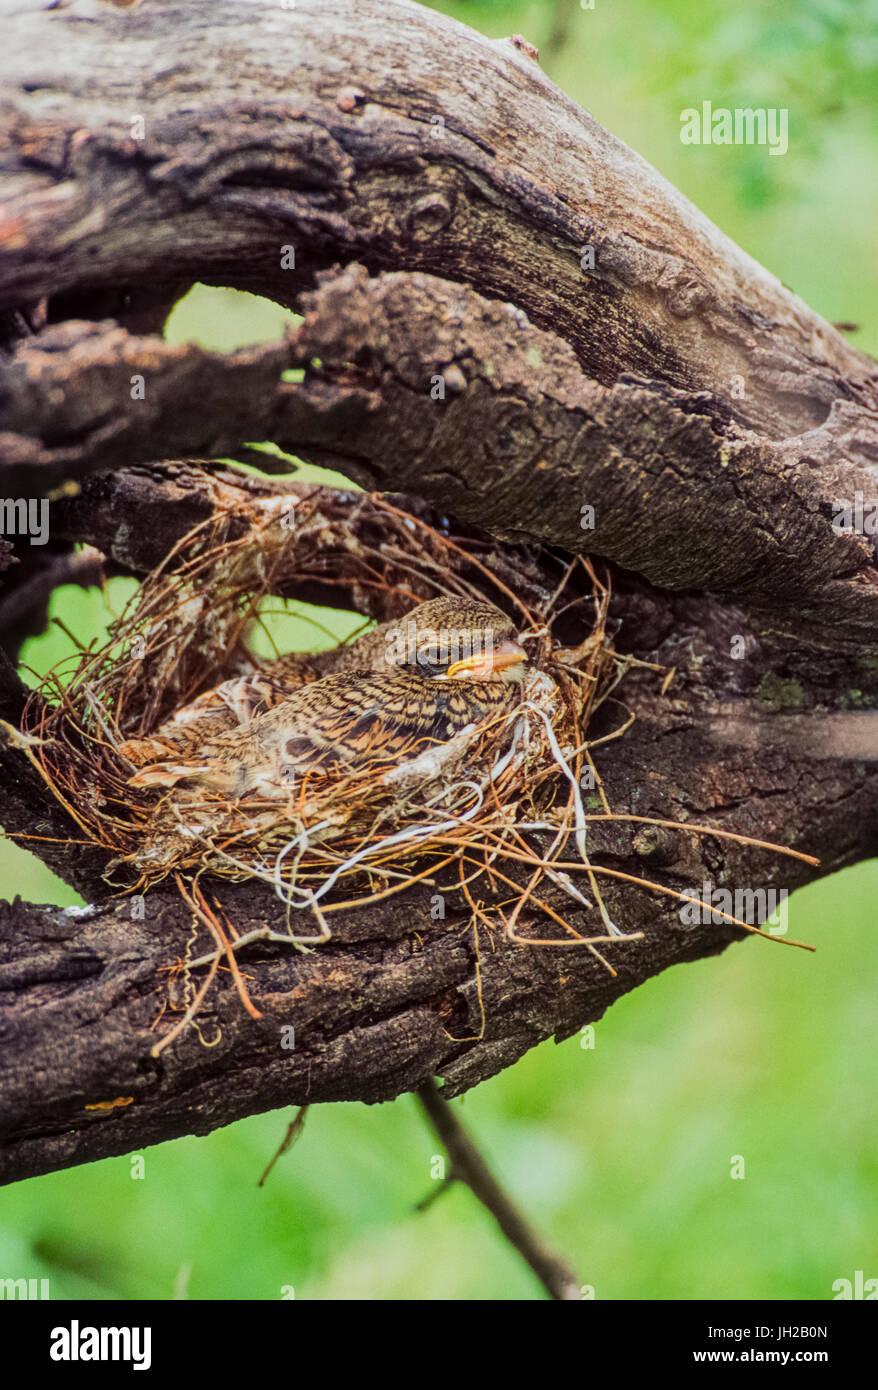 Bay-backed shrike, ((Lanius vittatus), fledgling in nest, Keoladeo Ghana National Park, Bharatpur, Rajasthan, India - Stock Image